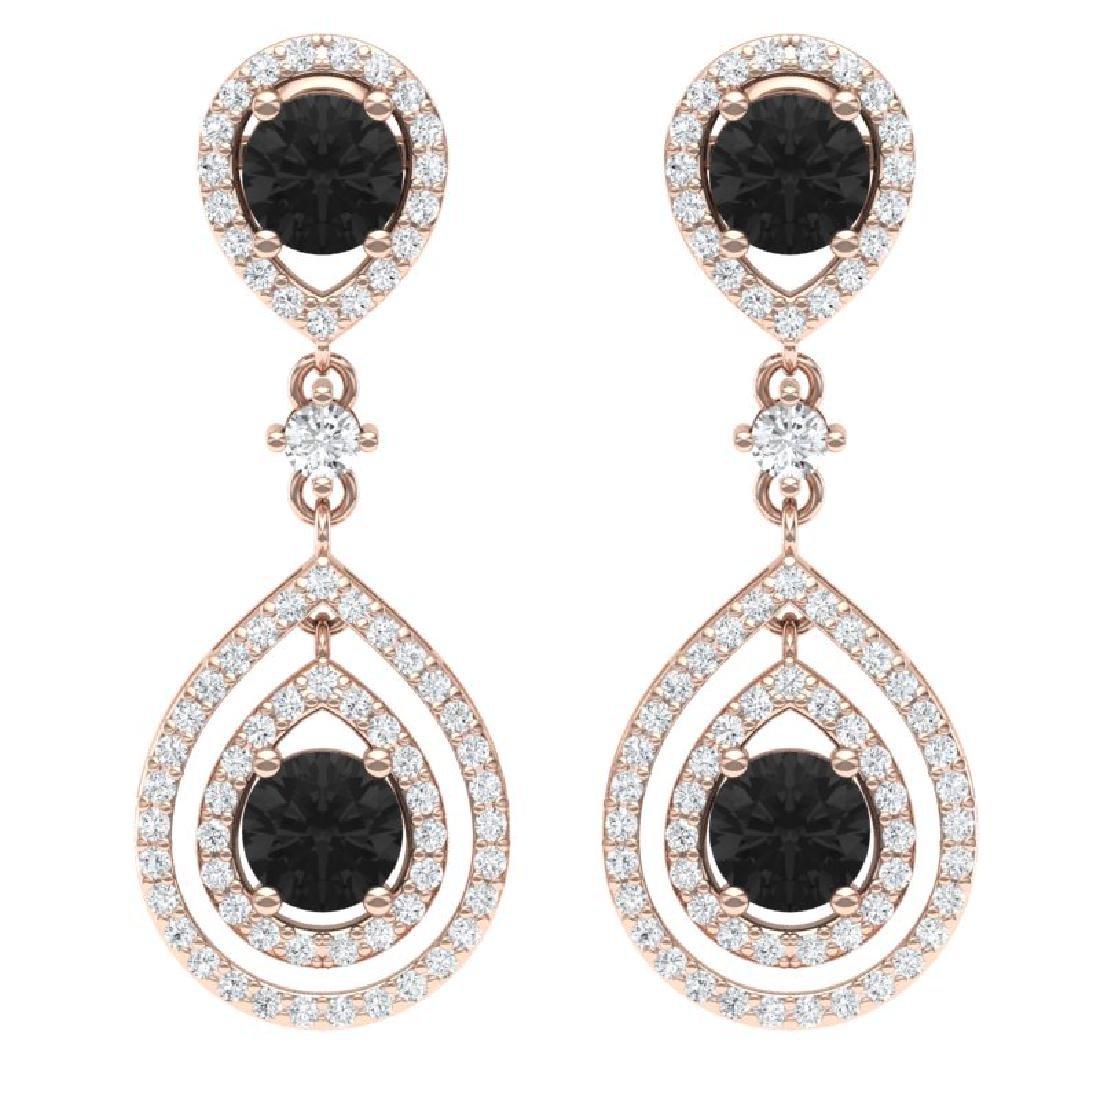 3.62 CTW Certified Black VS Diamond Earrings 18K Rose